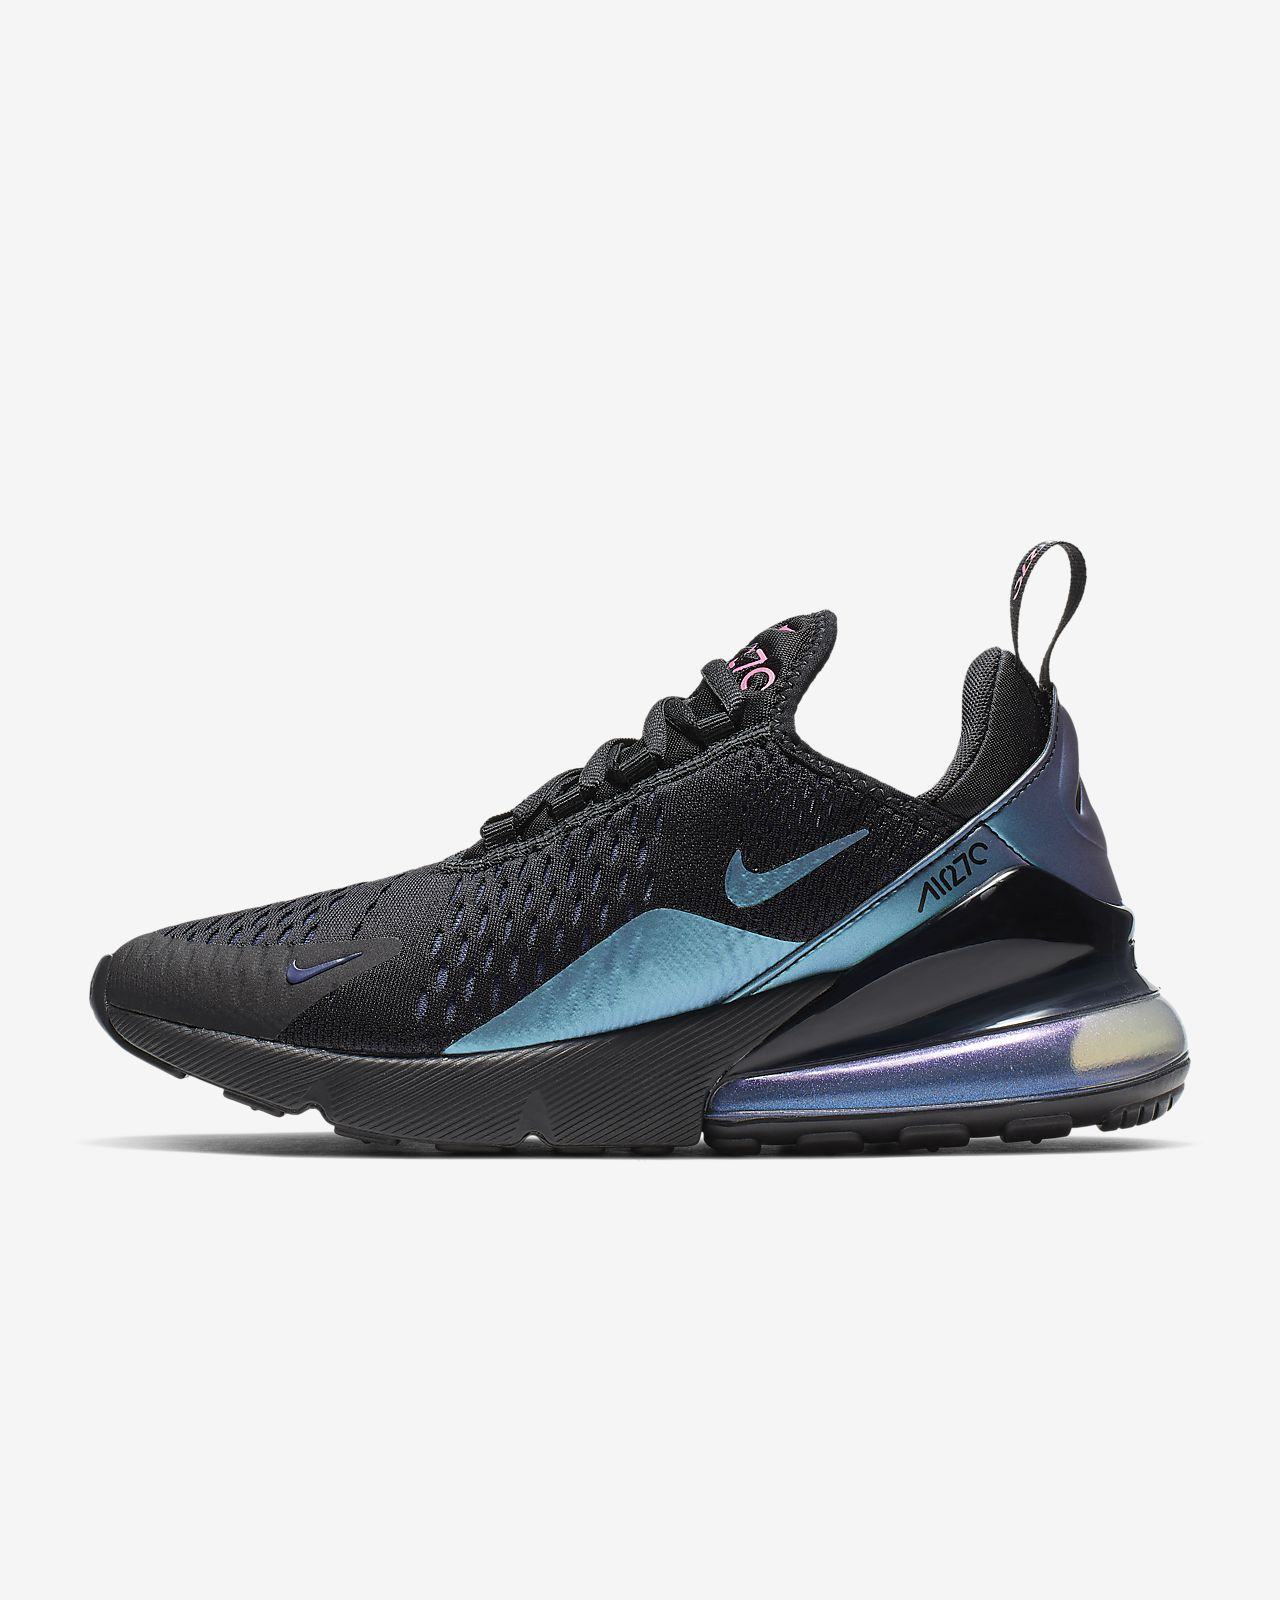 new products f23db f3aaa Sko Nike Air Max 270 för kvinnor